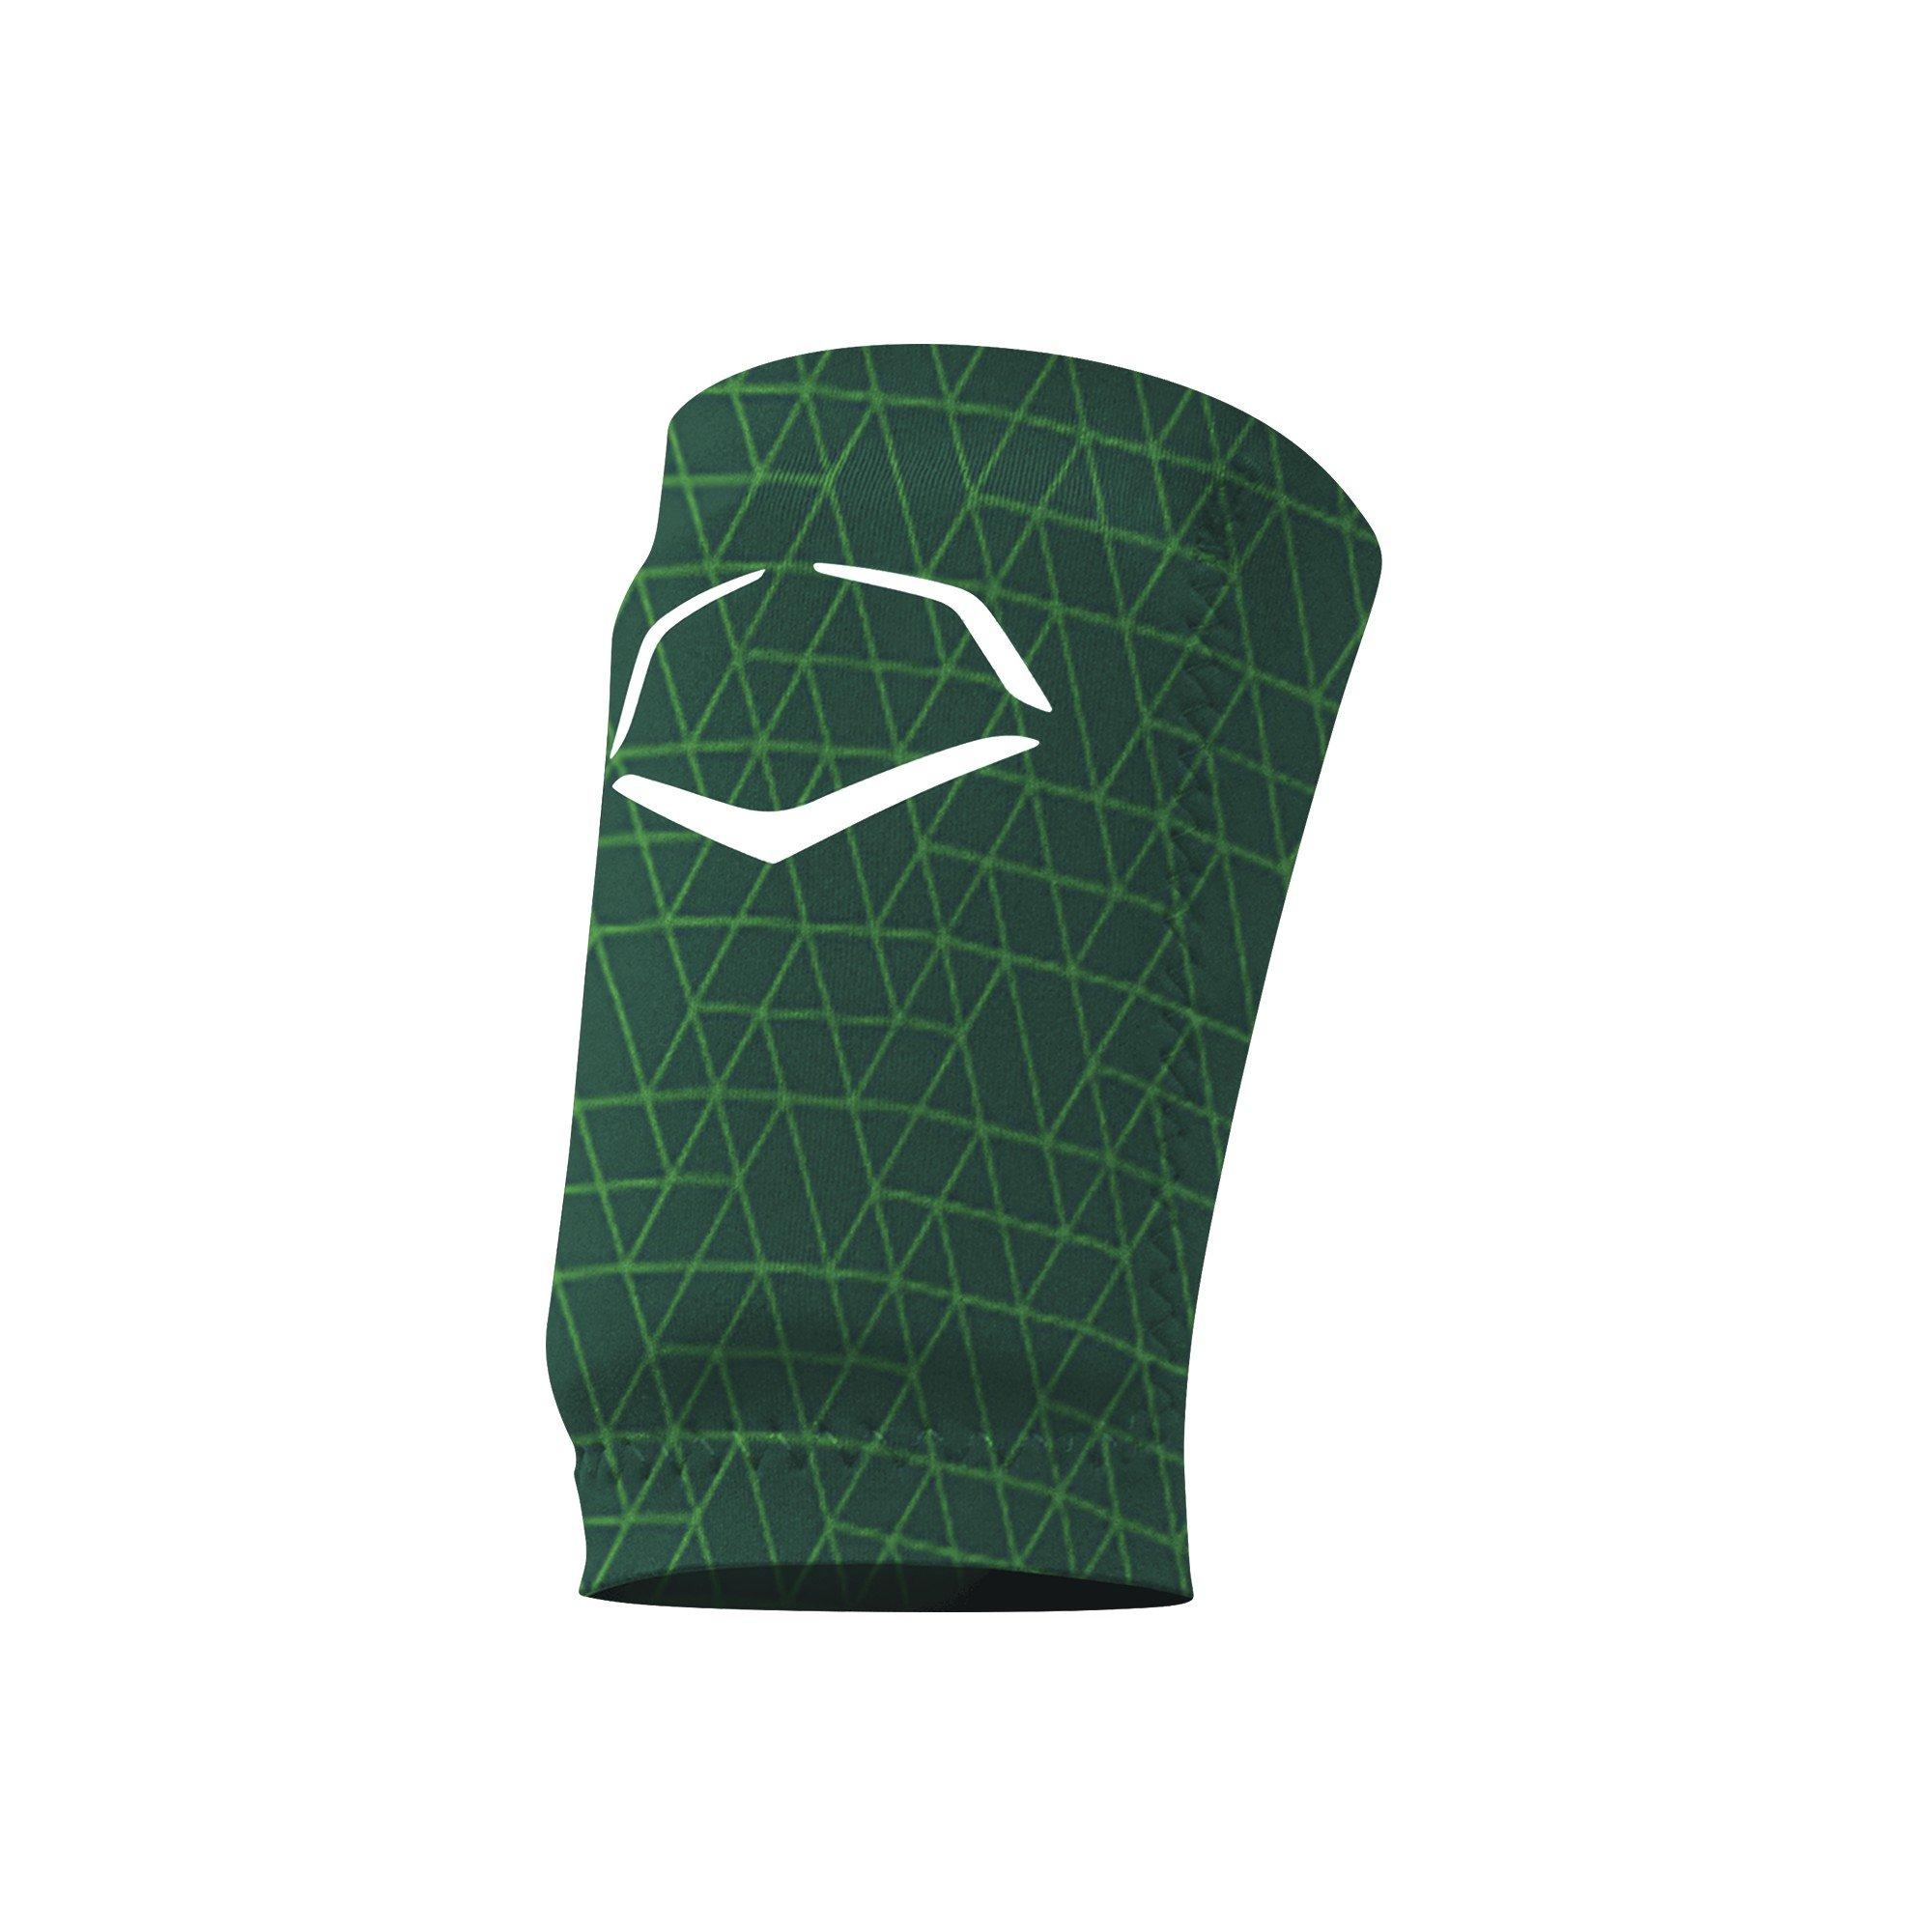 EvoShield EvoCharge Protective Wrist Guard - Extra